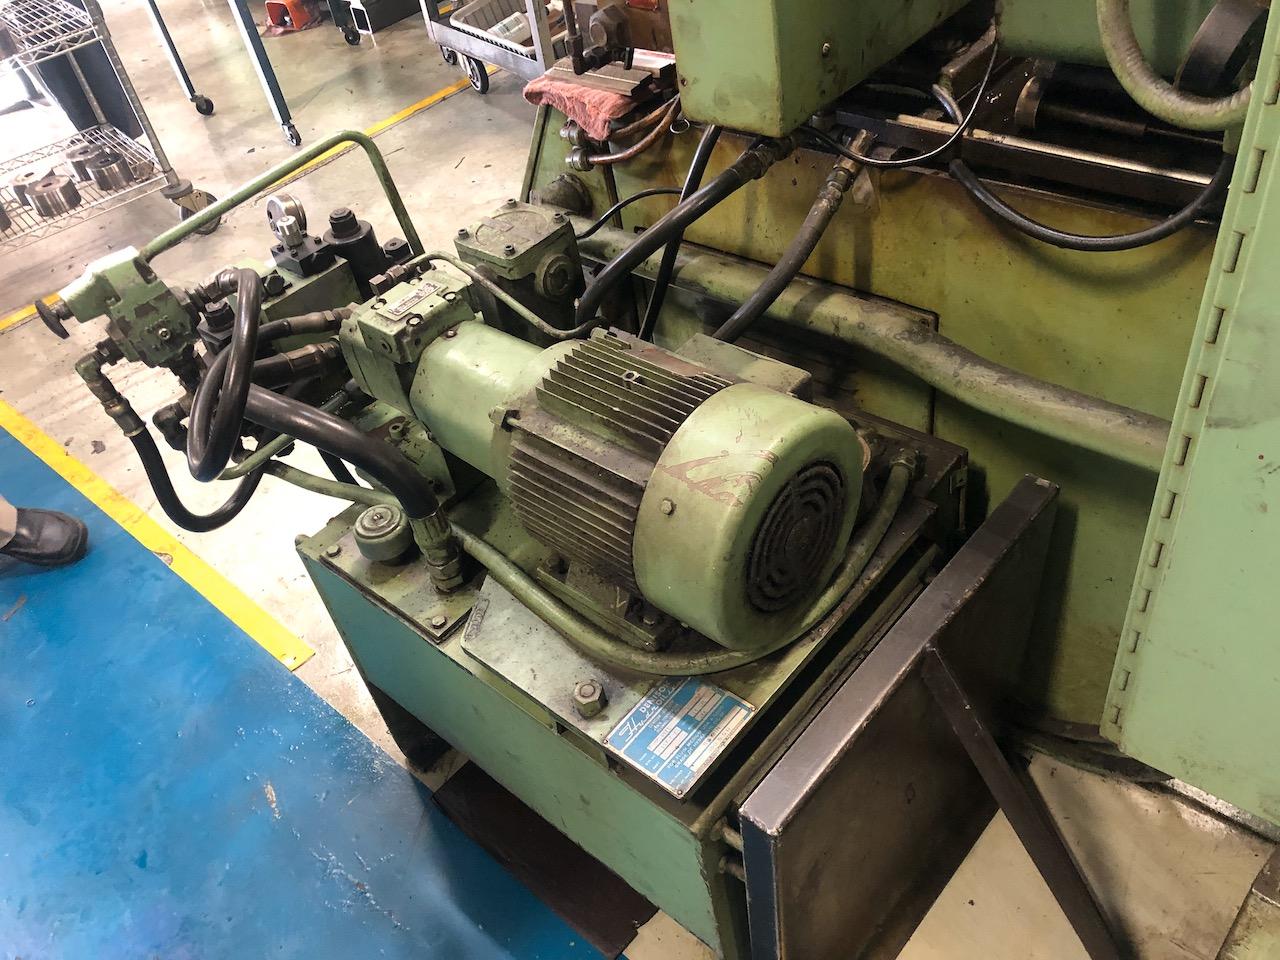 "4"" Landis Model 32TFRI 2 Die Cylindrical Thread Roller"